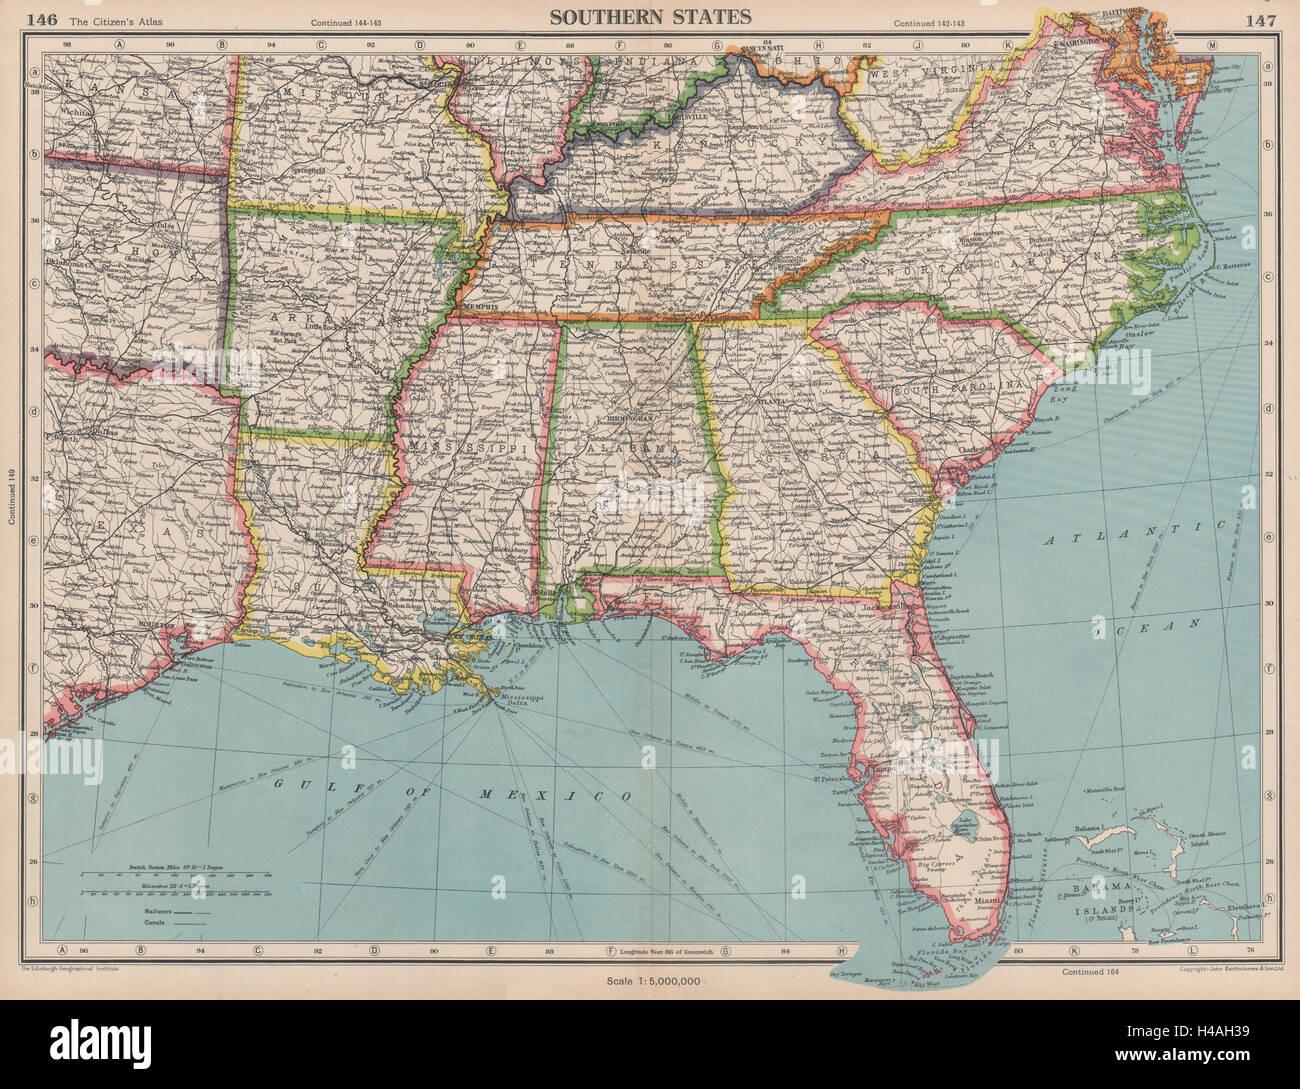 USA SOUTHERN STATES Florida Georgia LA MS AL NC SC TN AR KY Stock ...